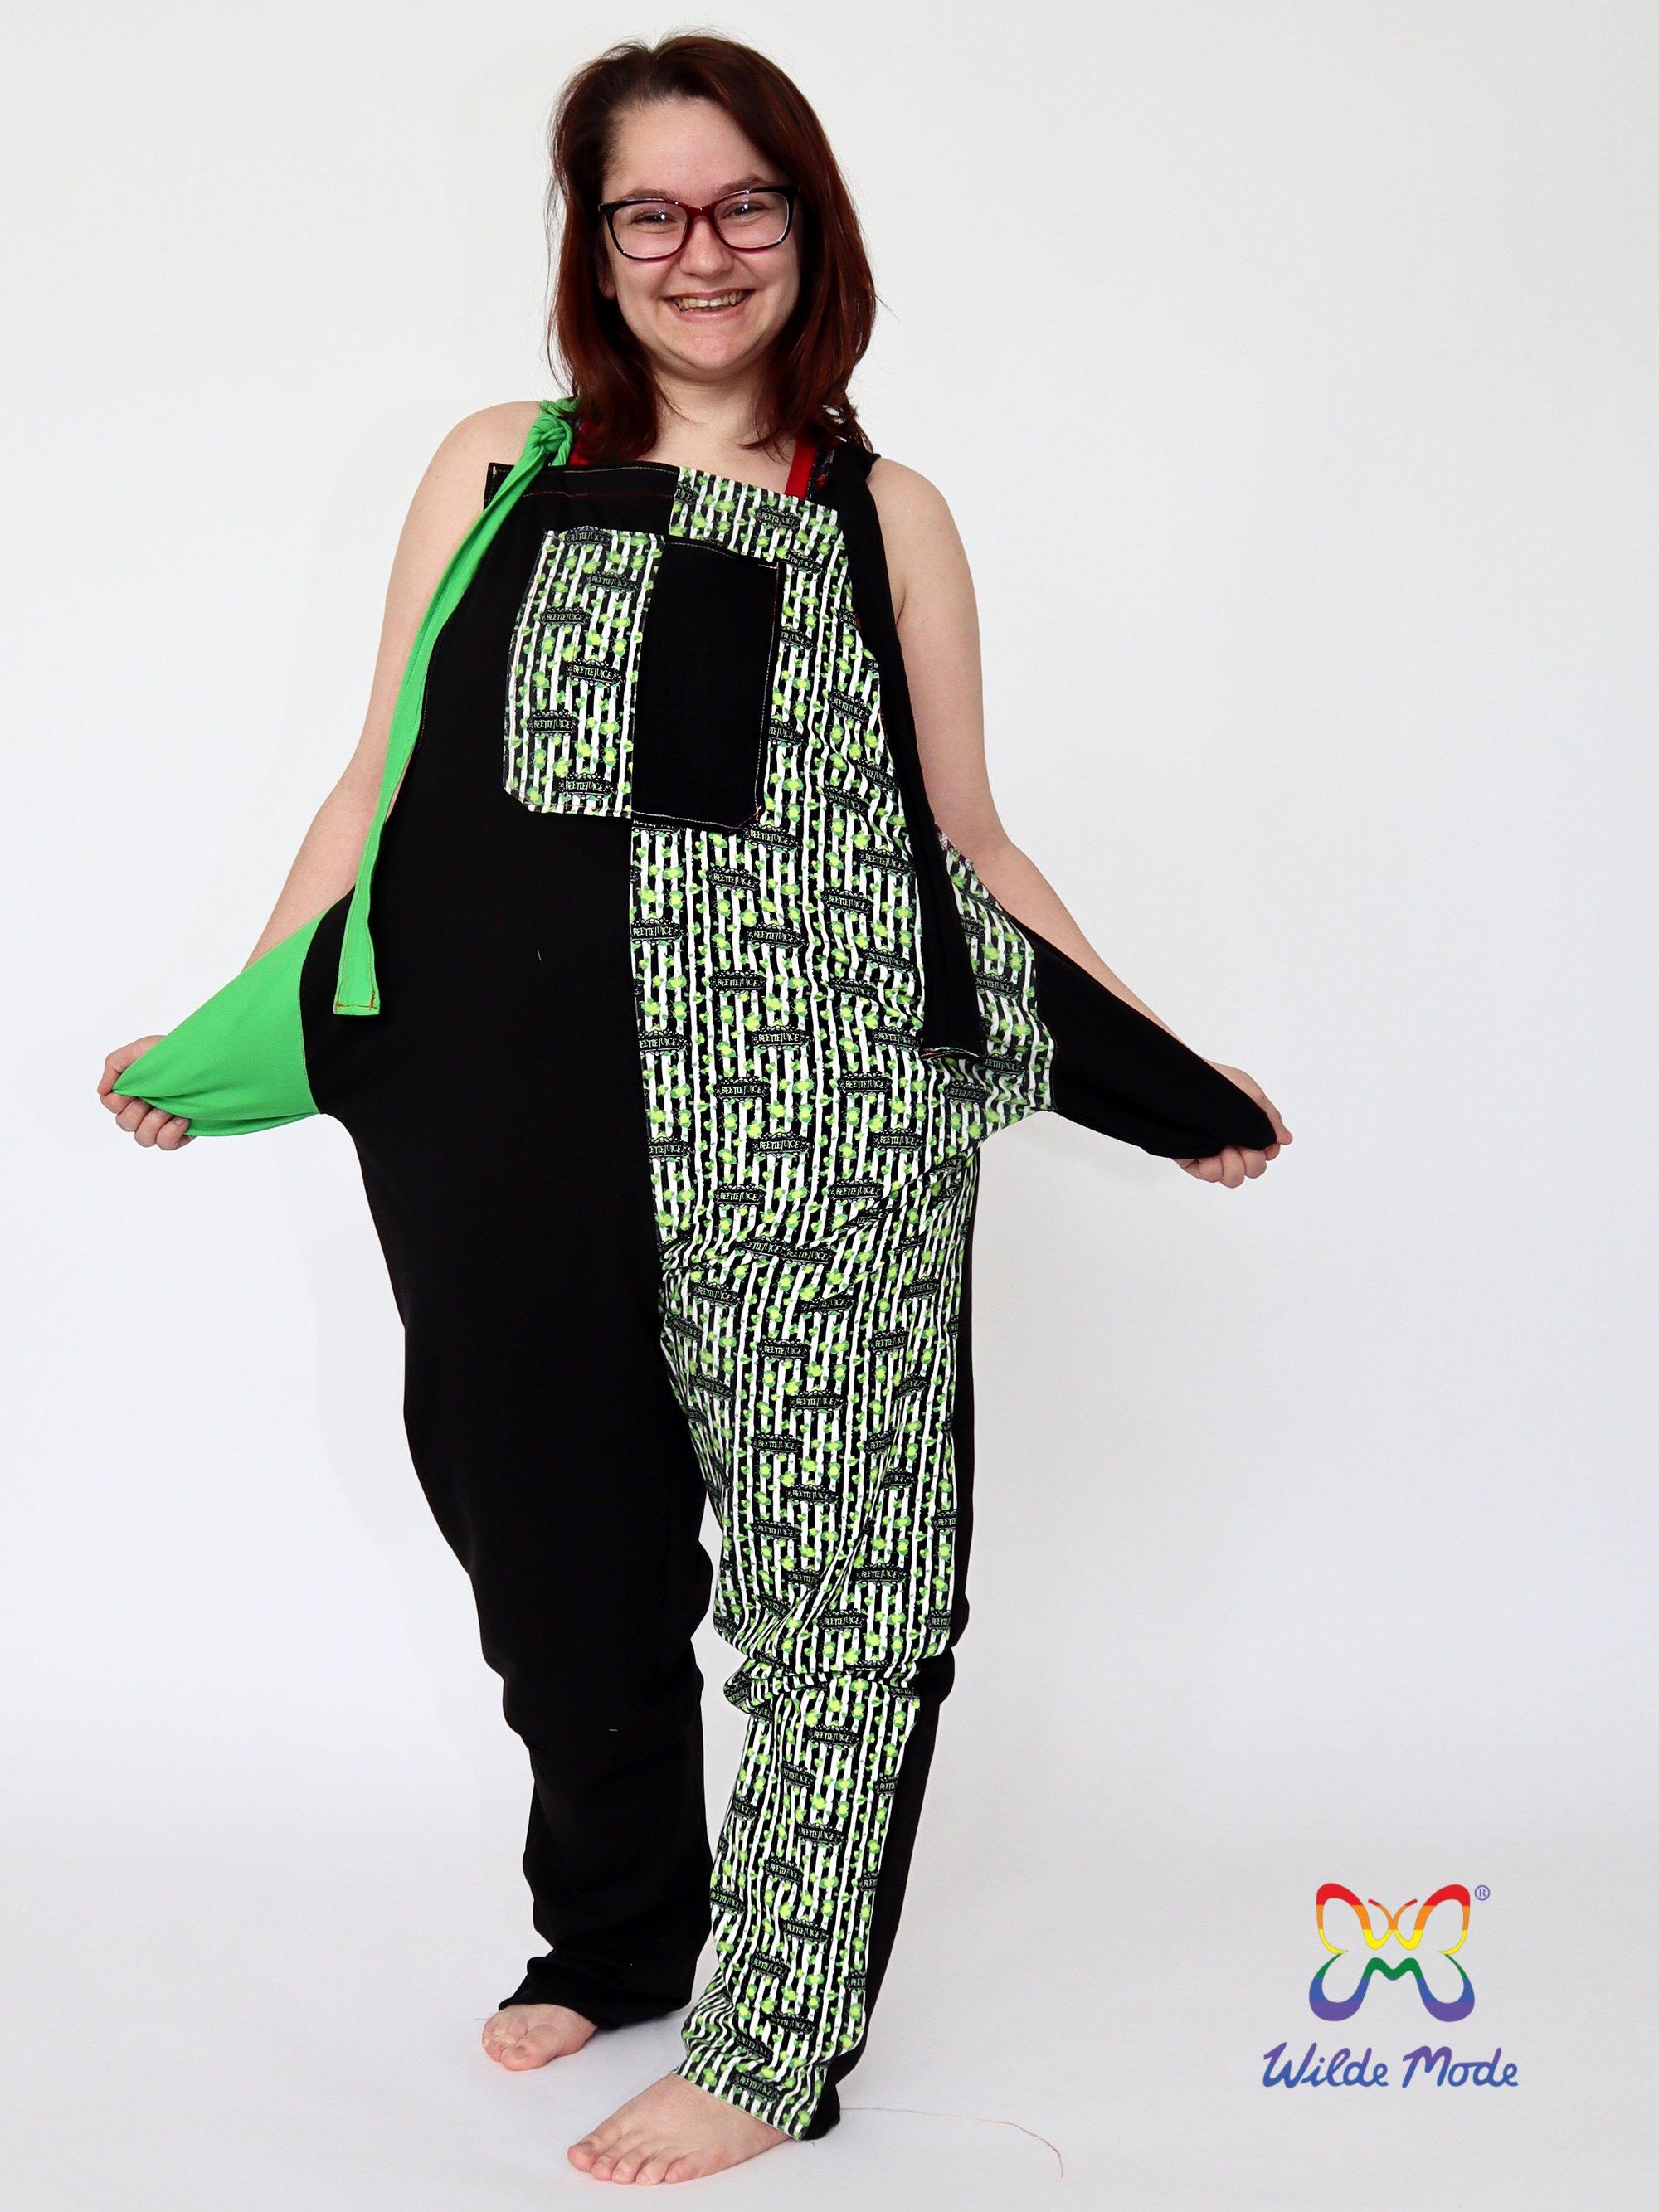 One of Deborah's exclusive designs, Beetlejuice-inspired dungarees